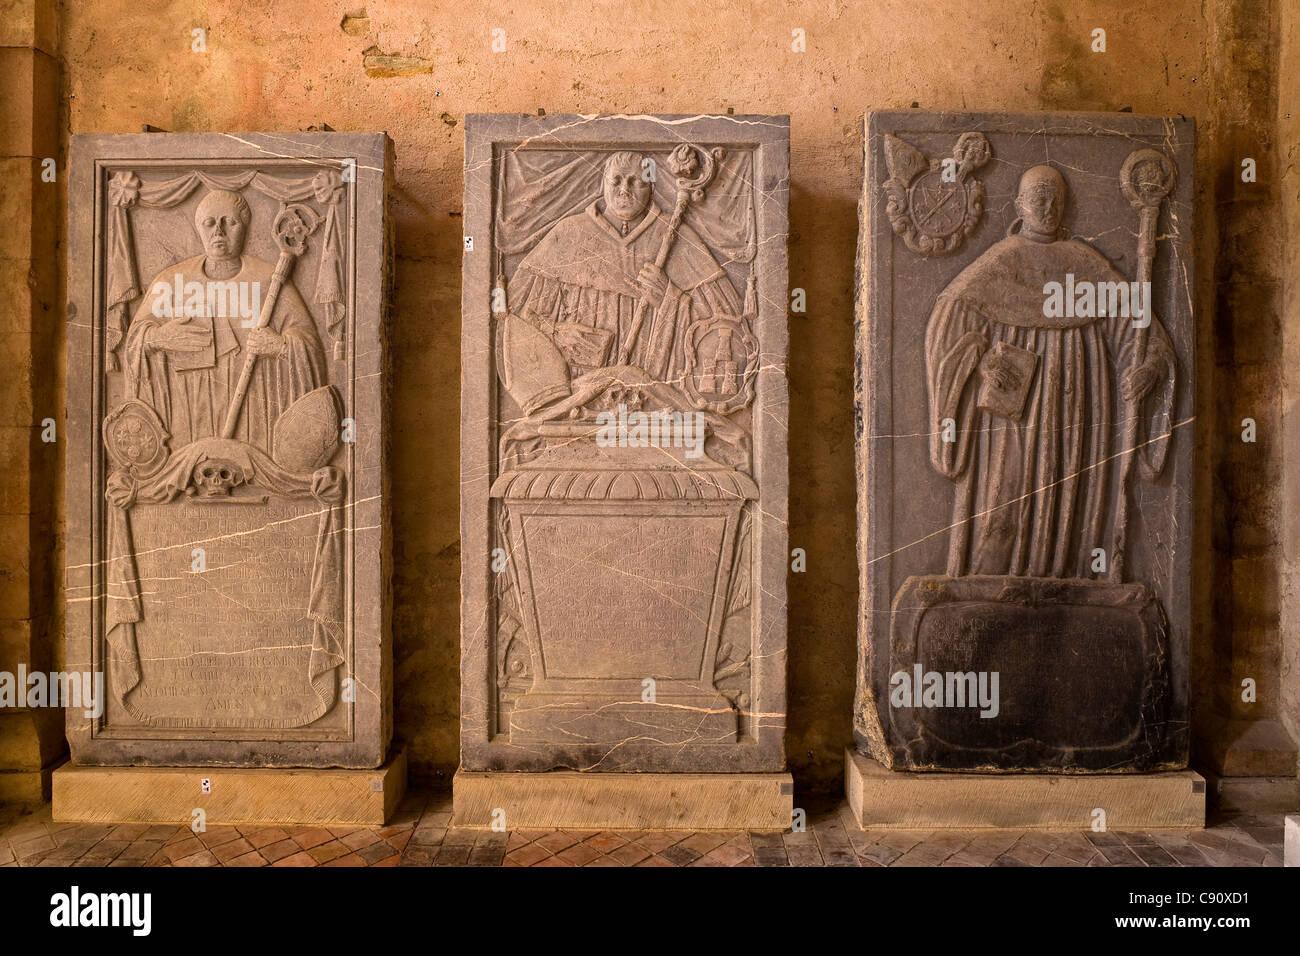 Tombstones at Eberbach abbey, a medieval monastery in Eltville am Rhein, Rheingau, Hesse, Germany, Europe - Stock Image